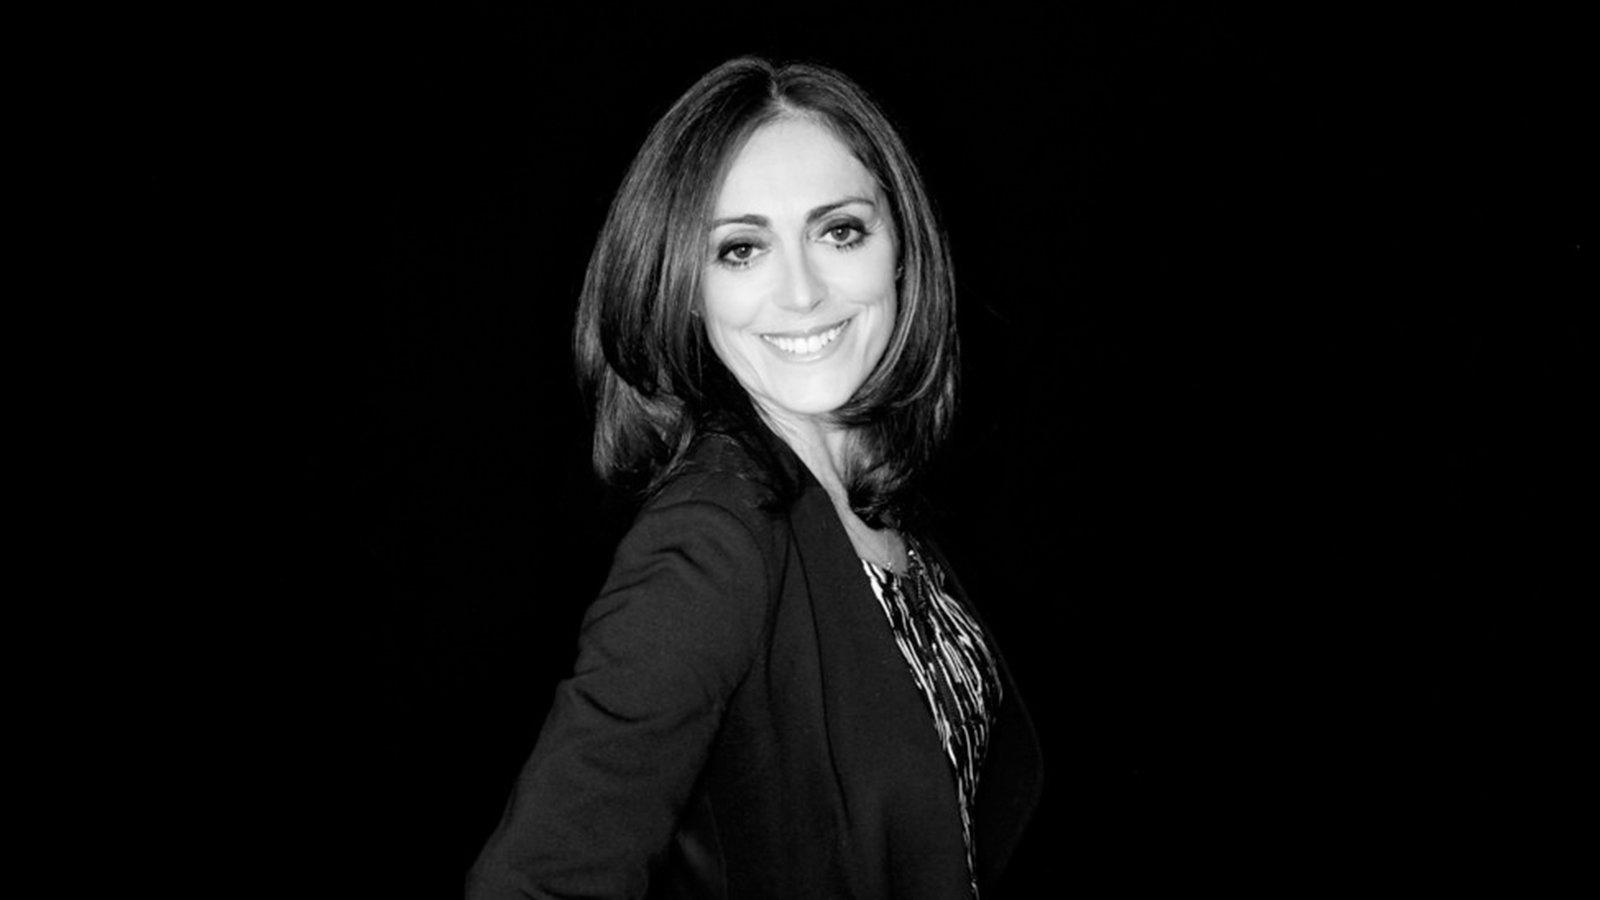 Marta Martinez, Global Head of AOL Video Sales (Photo: Business Wire)